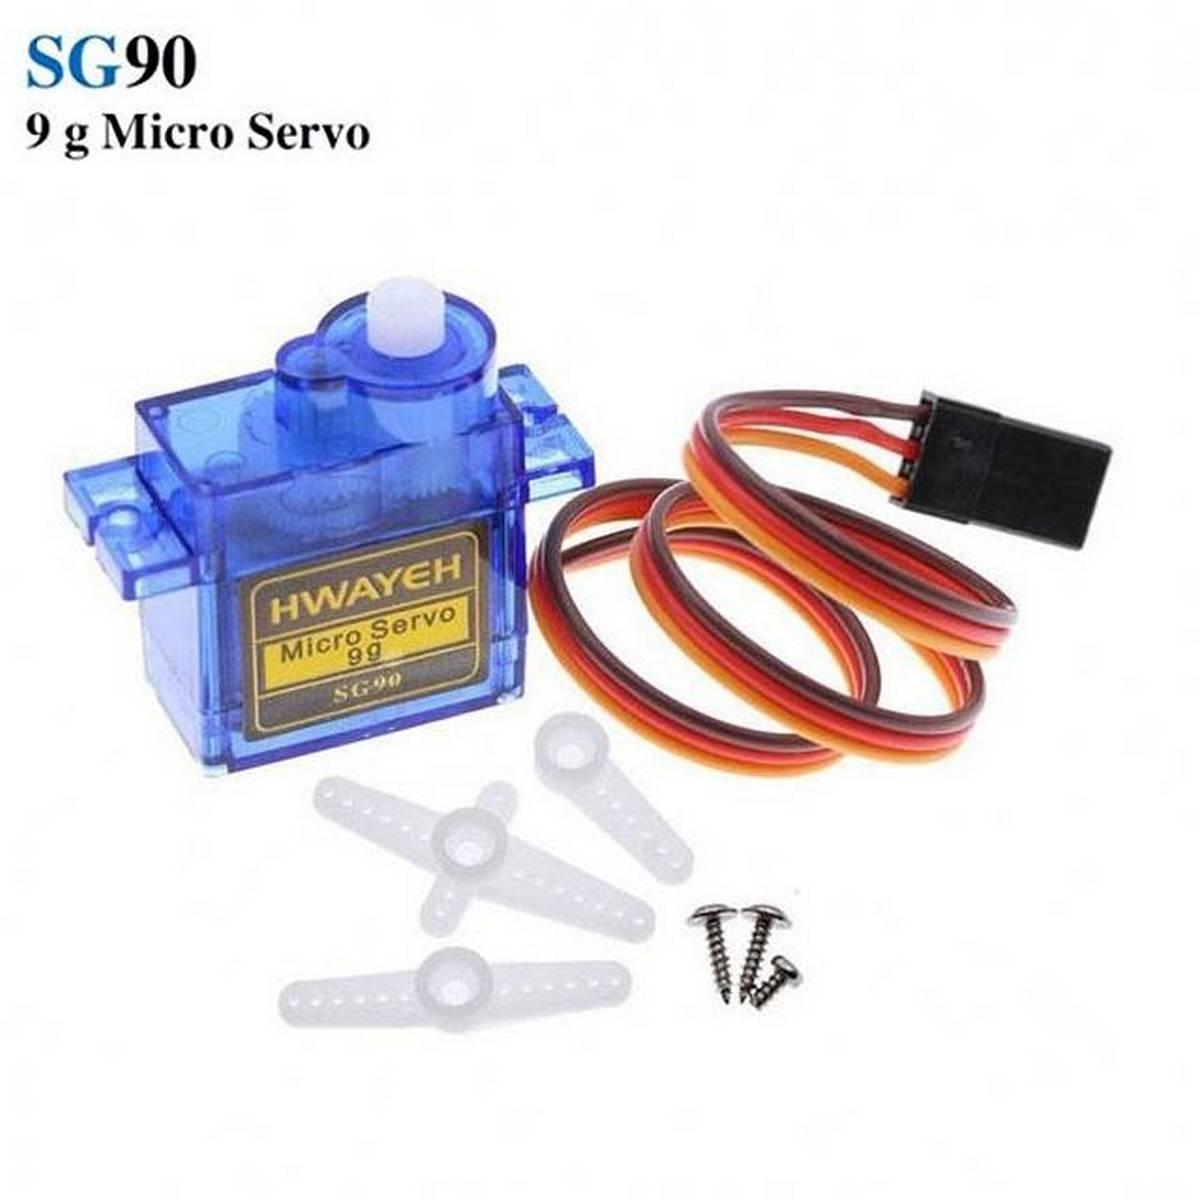 TowerPro SG90 9g Micro Servo Mini Gear Motor RC